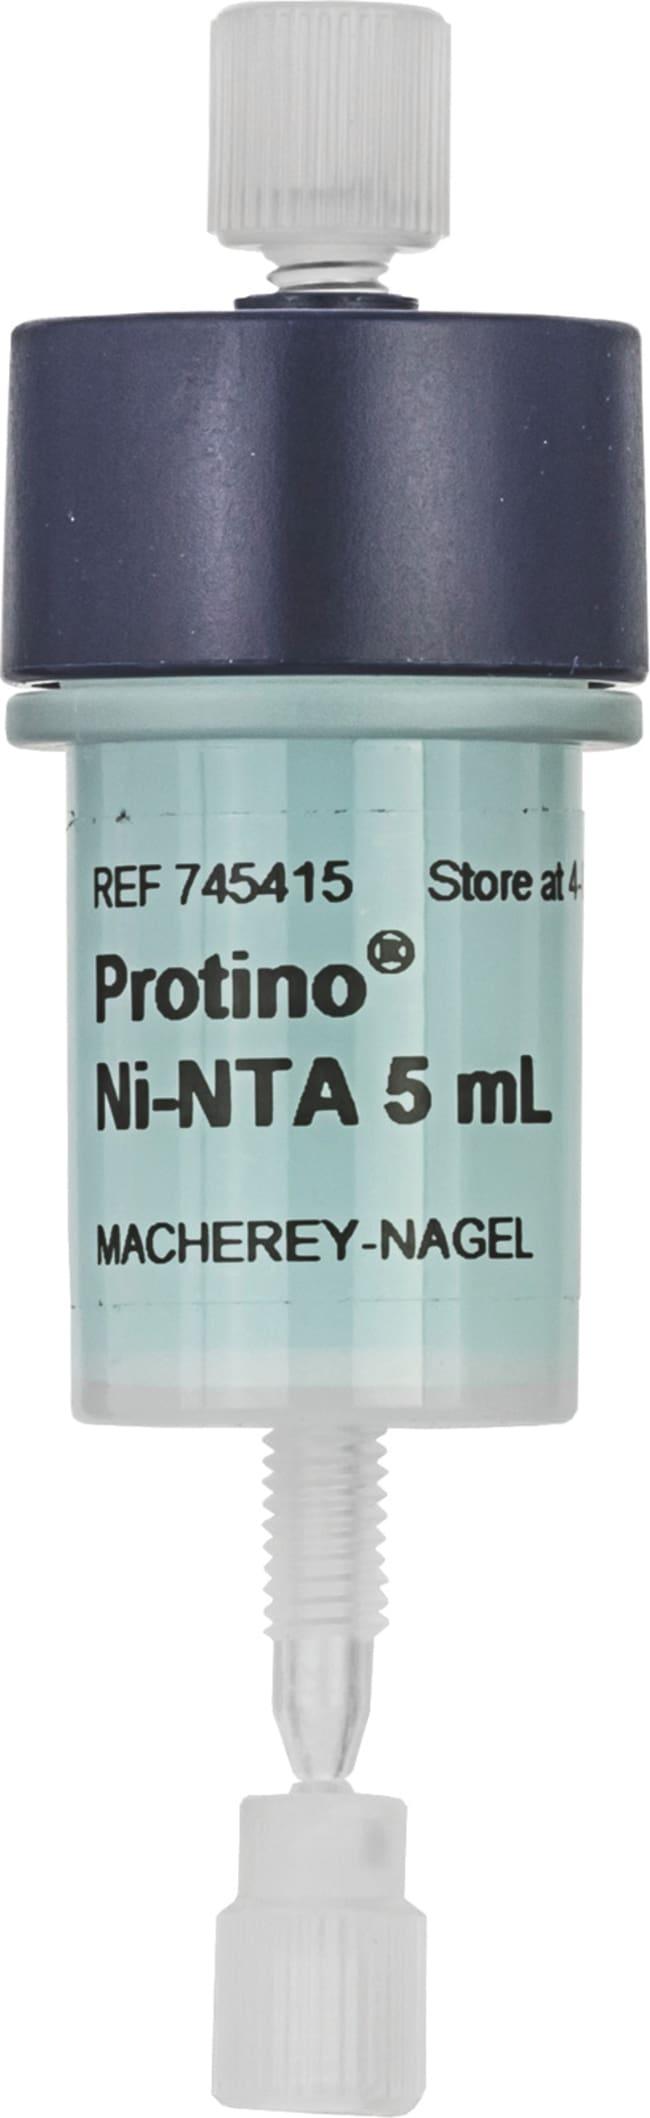 Macherey-Nagel Bioanalysis™Protino™ Ni-NTA 5 mL FPLC™ Columns Quantity: 5 x 5 mL Products